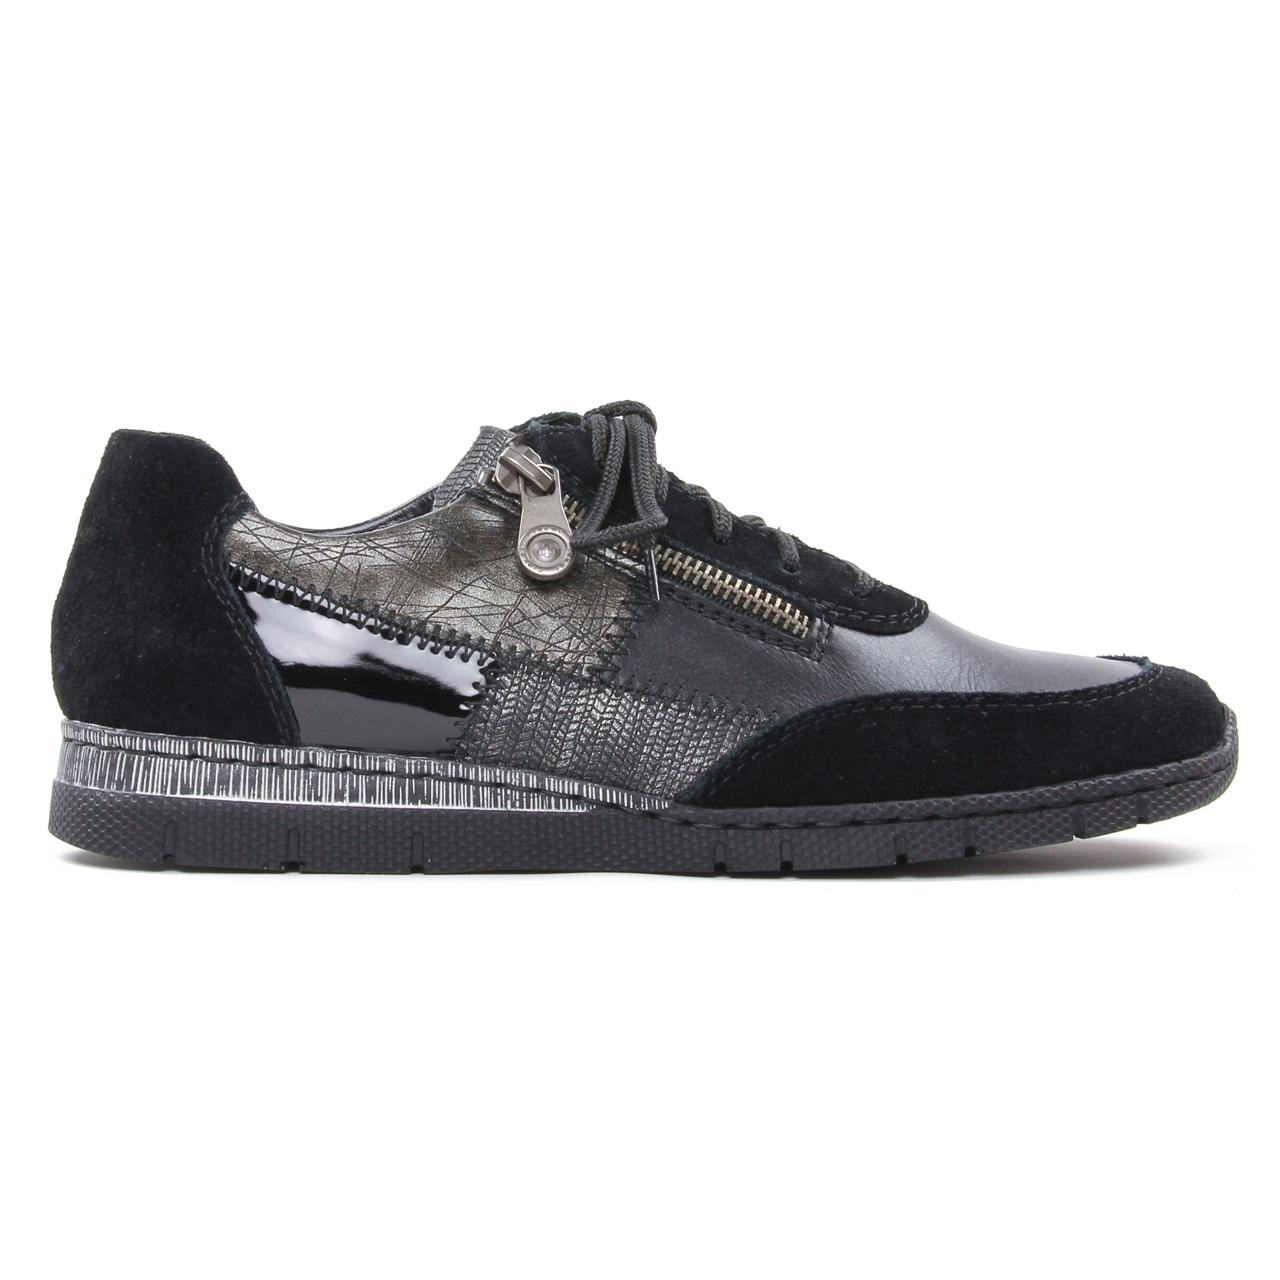 Rieker N5320 00 Schwarz | basket mode noir gris automne